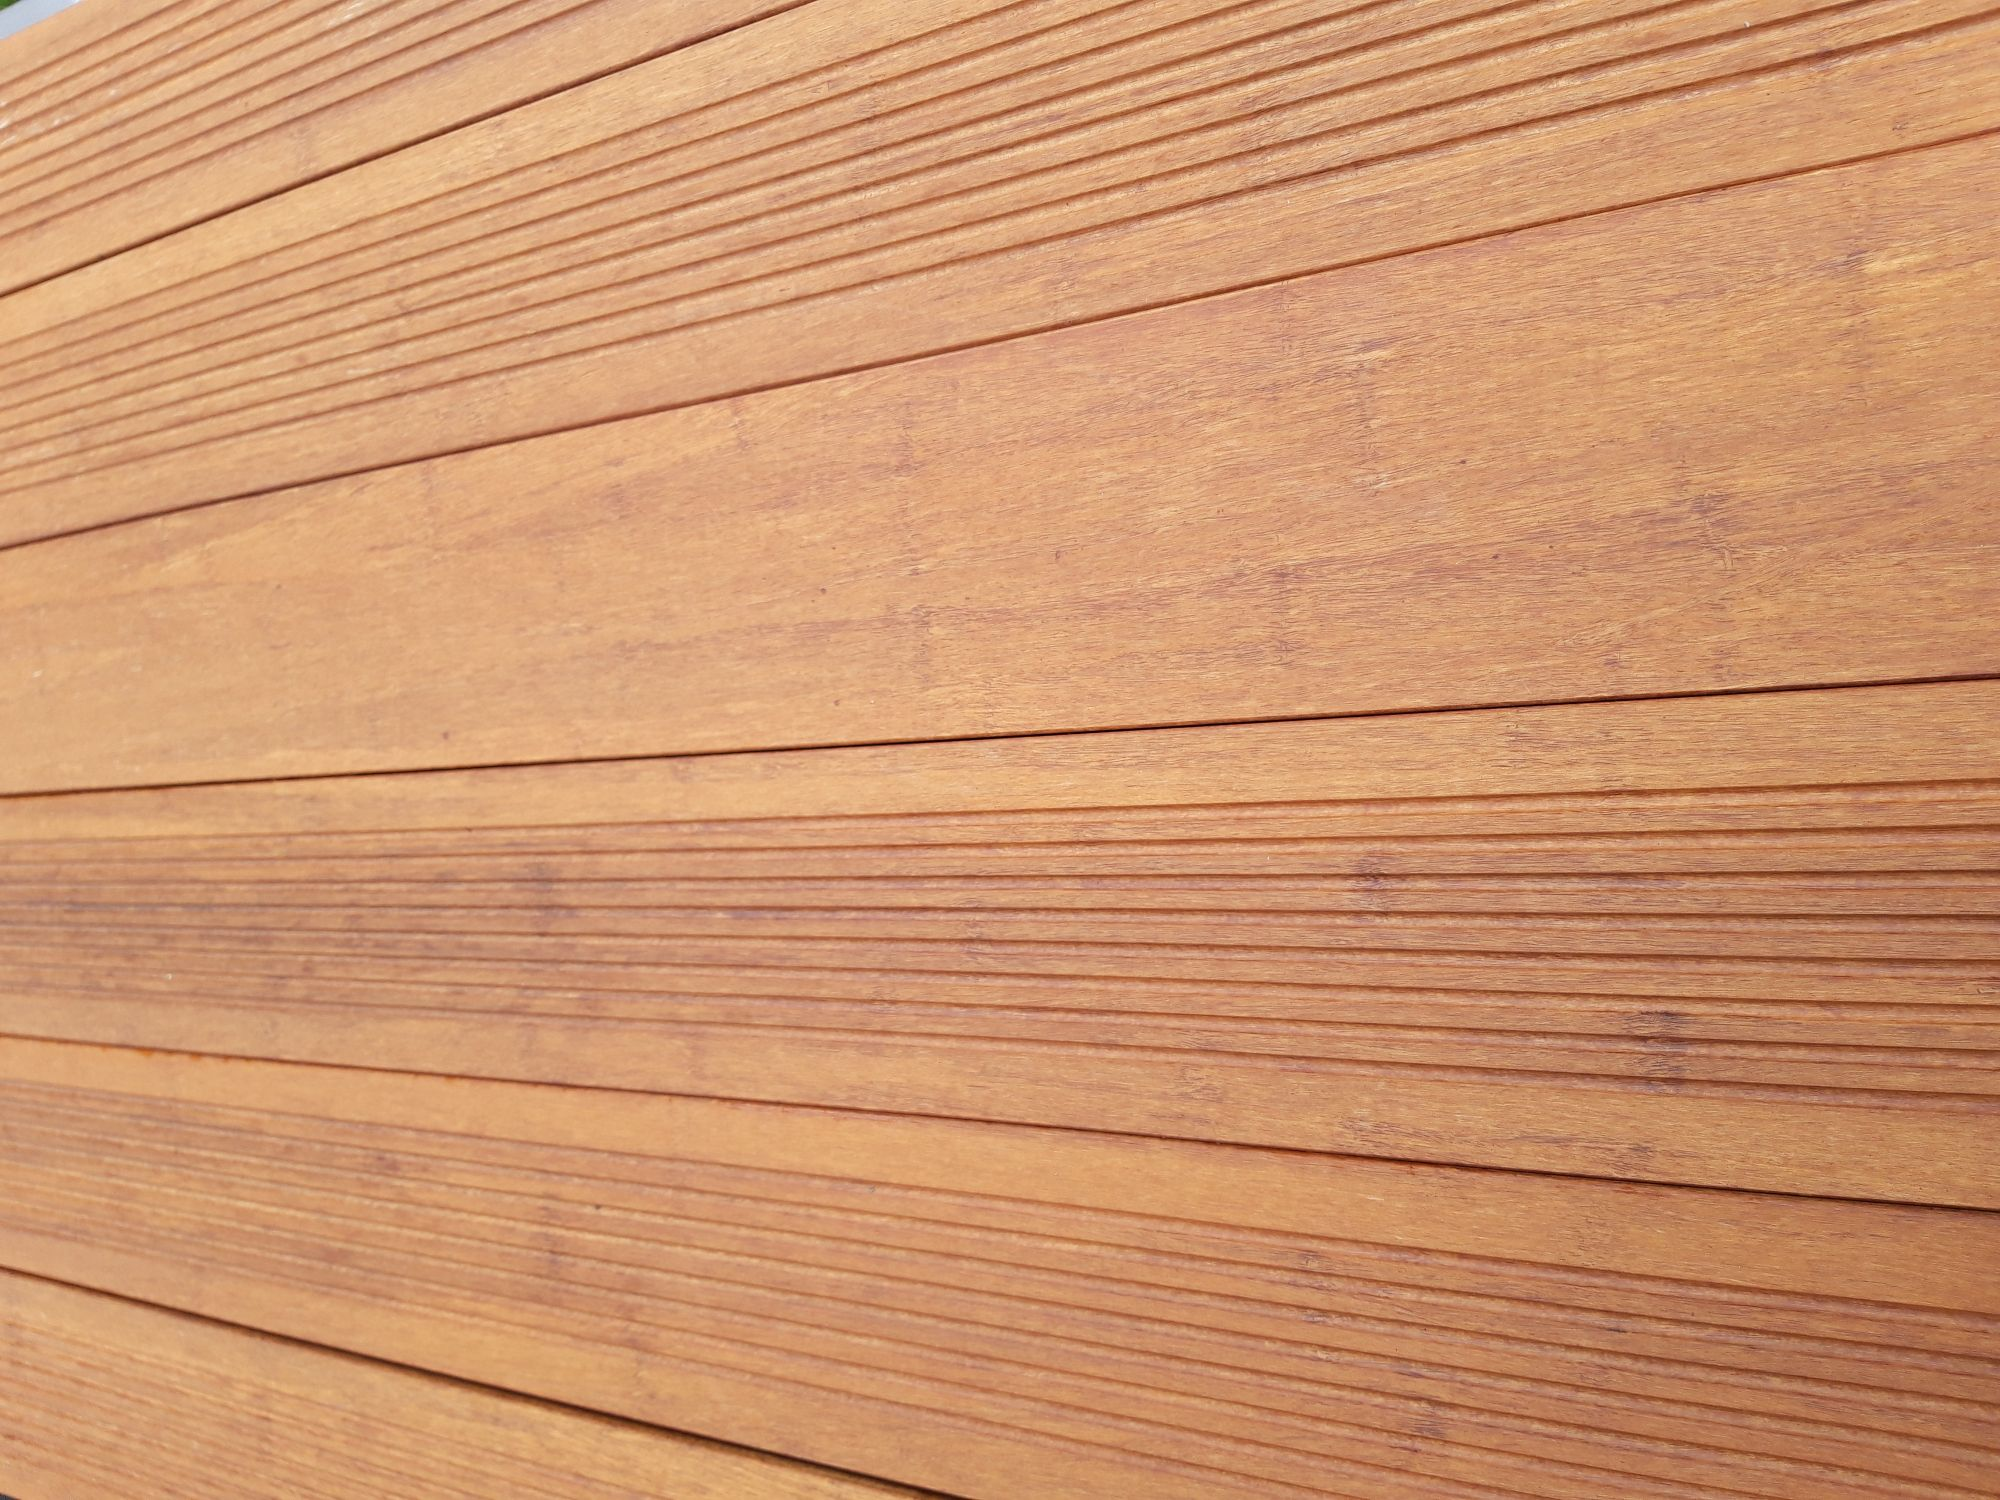 Terrasse en bambou n-durance